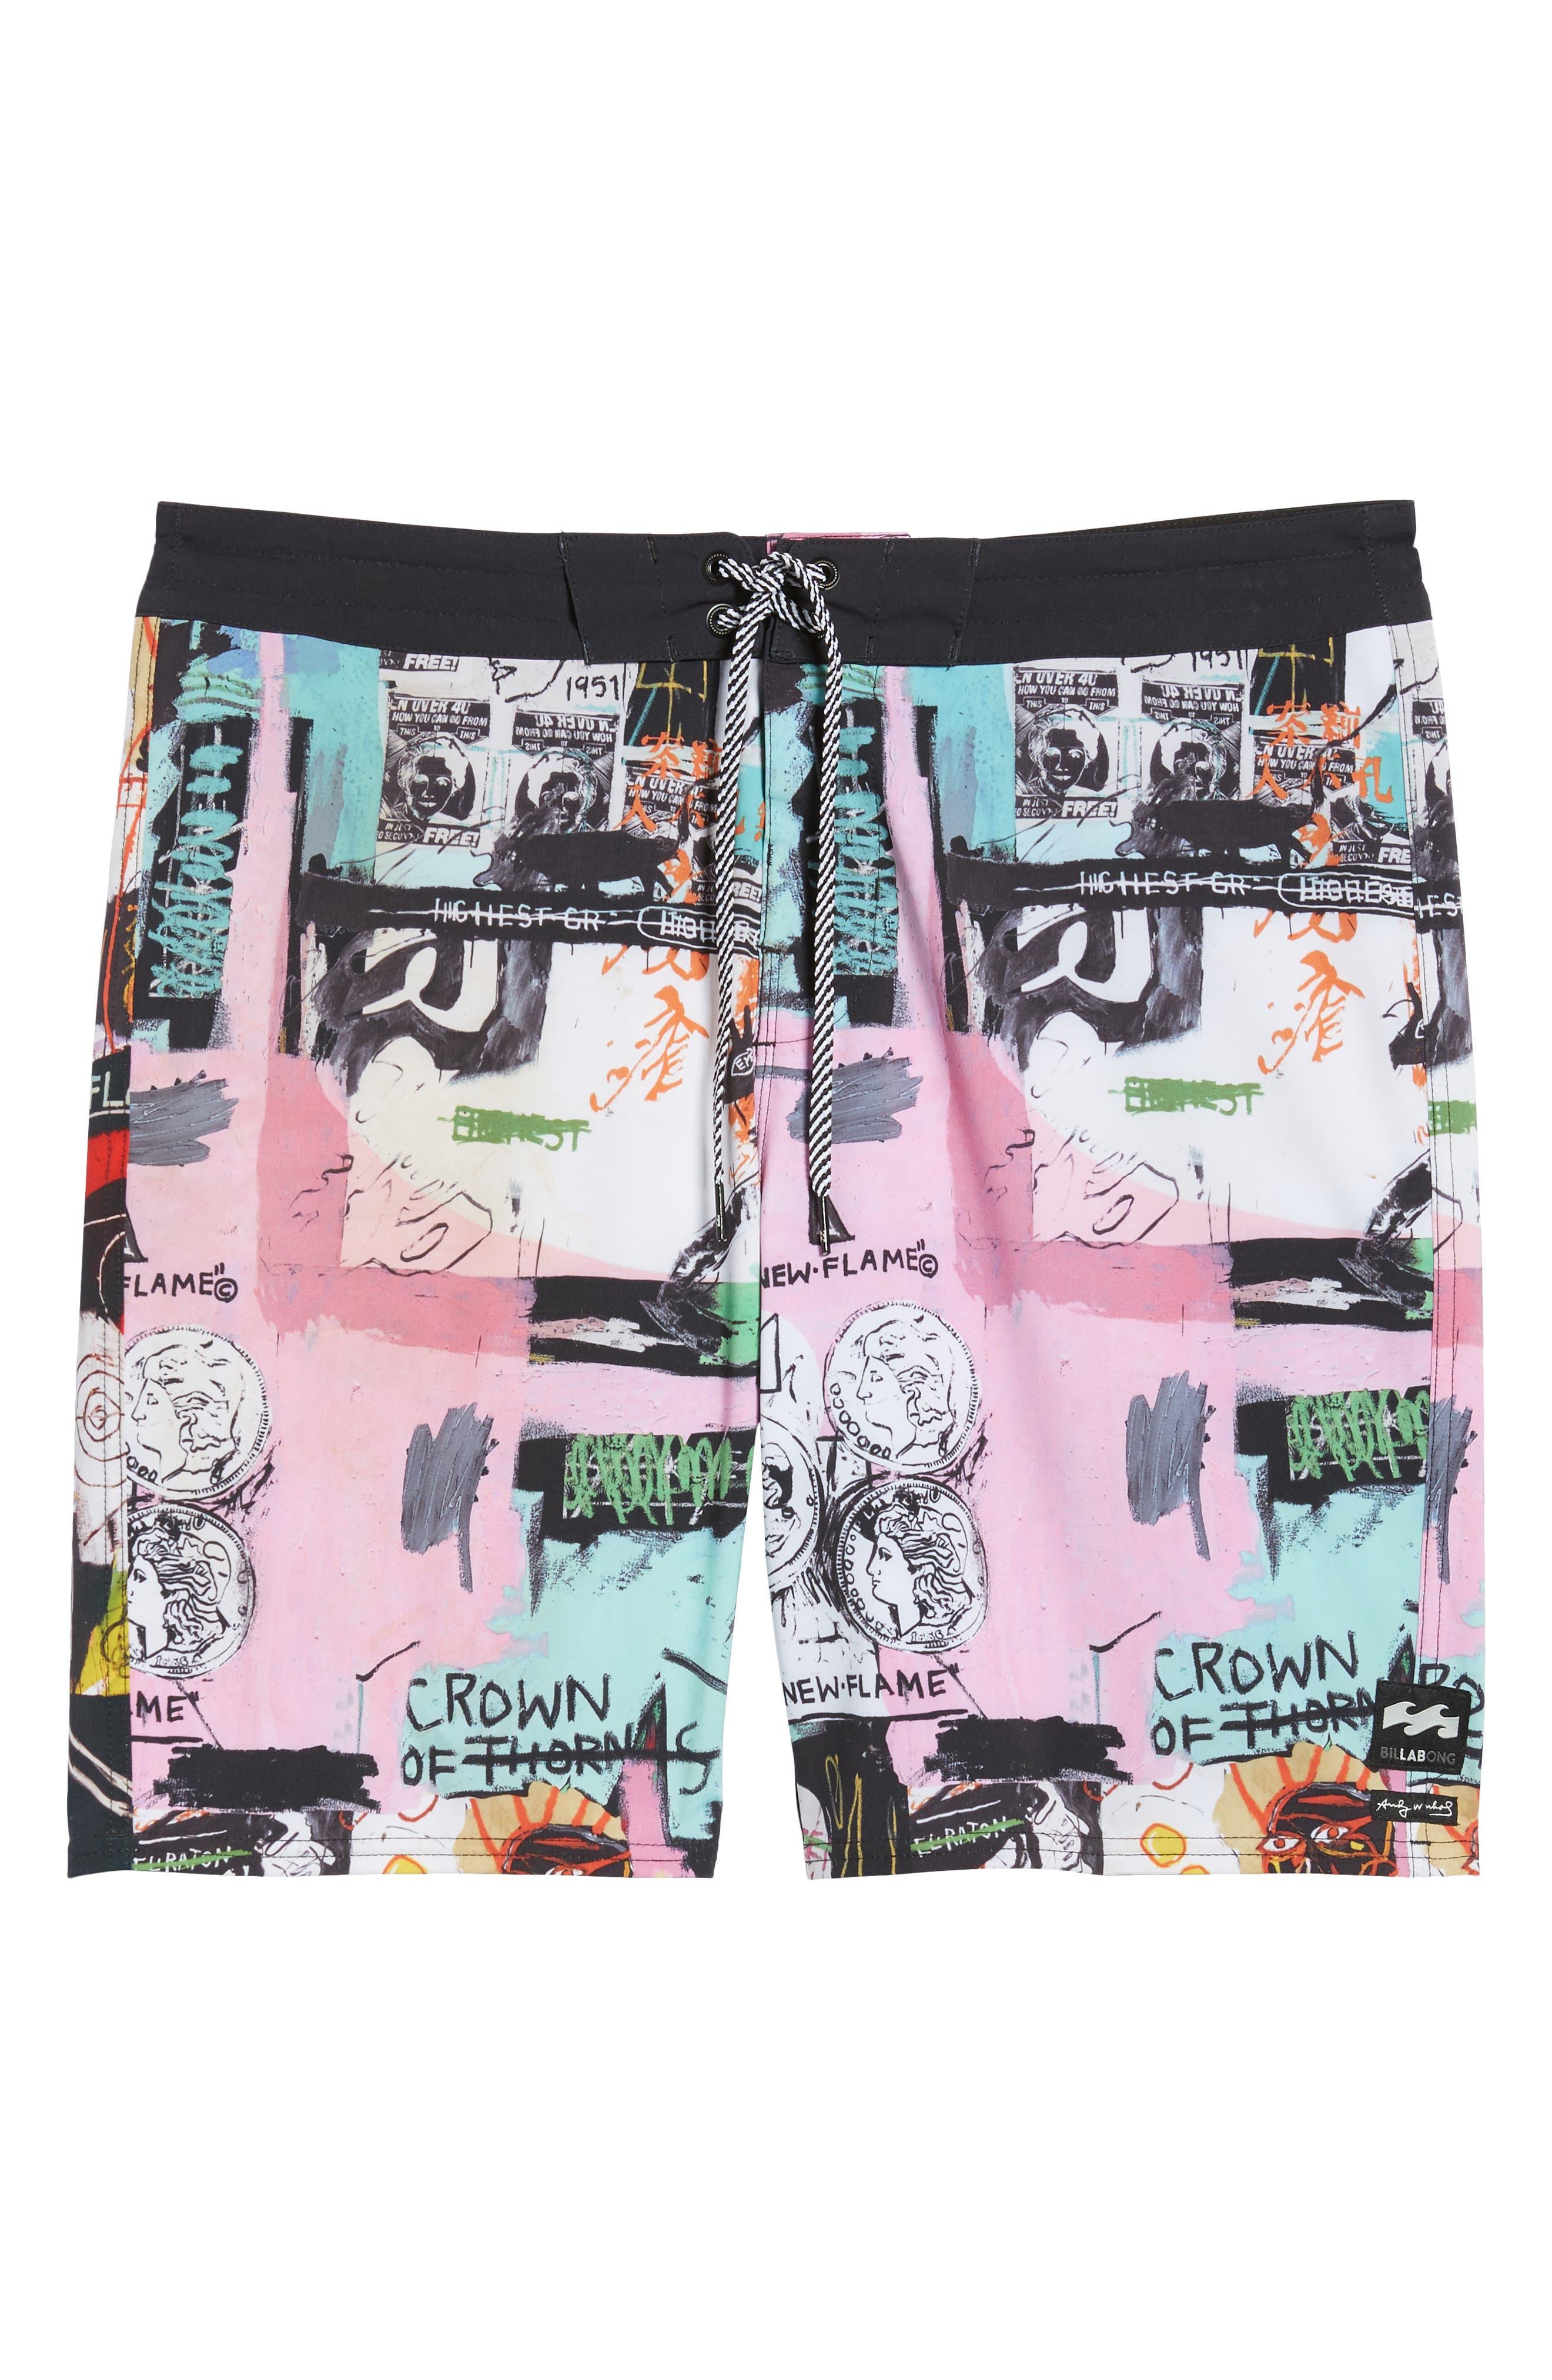 x Warhol Factory X Board Shorts,                             Alternate thumbnail 6, color,                             100